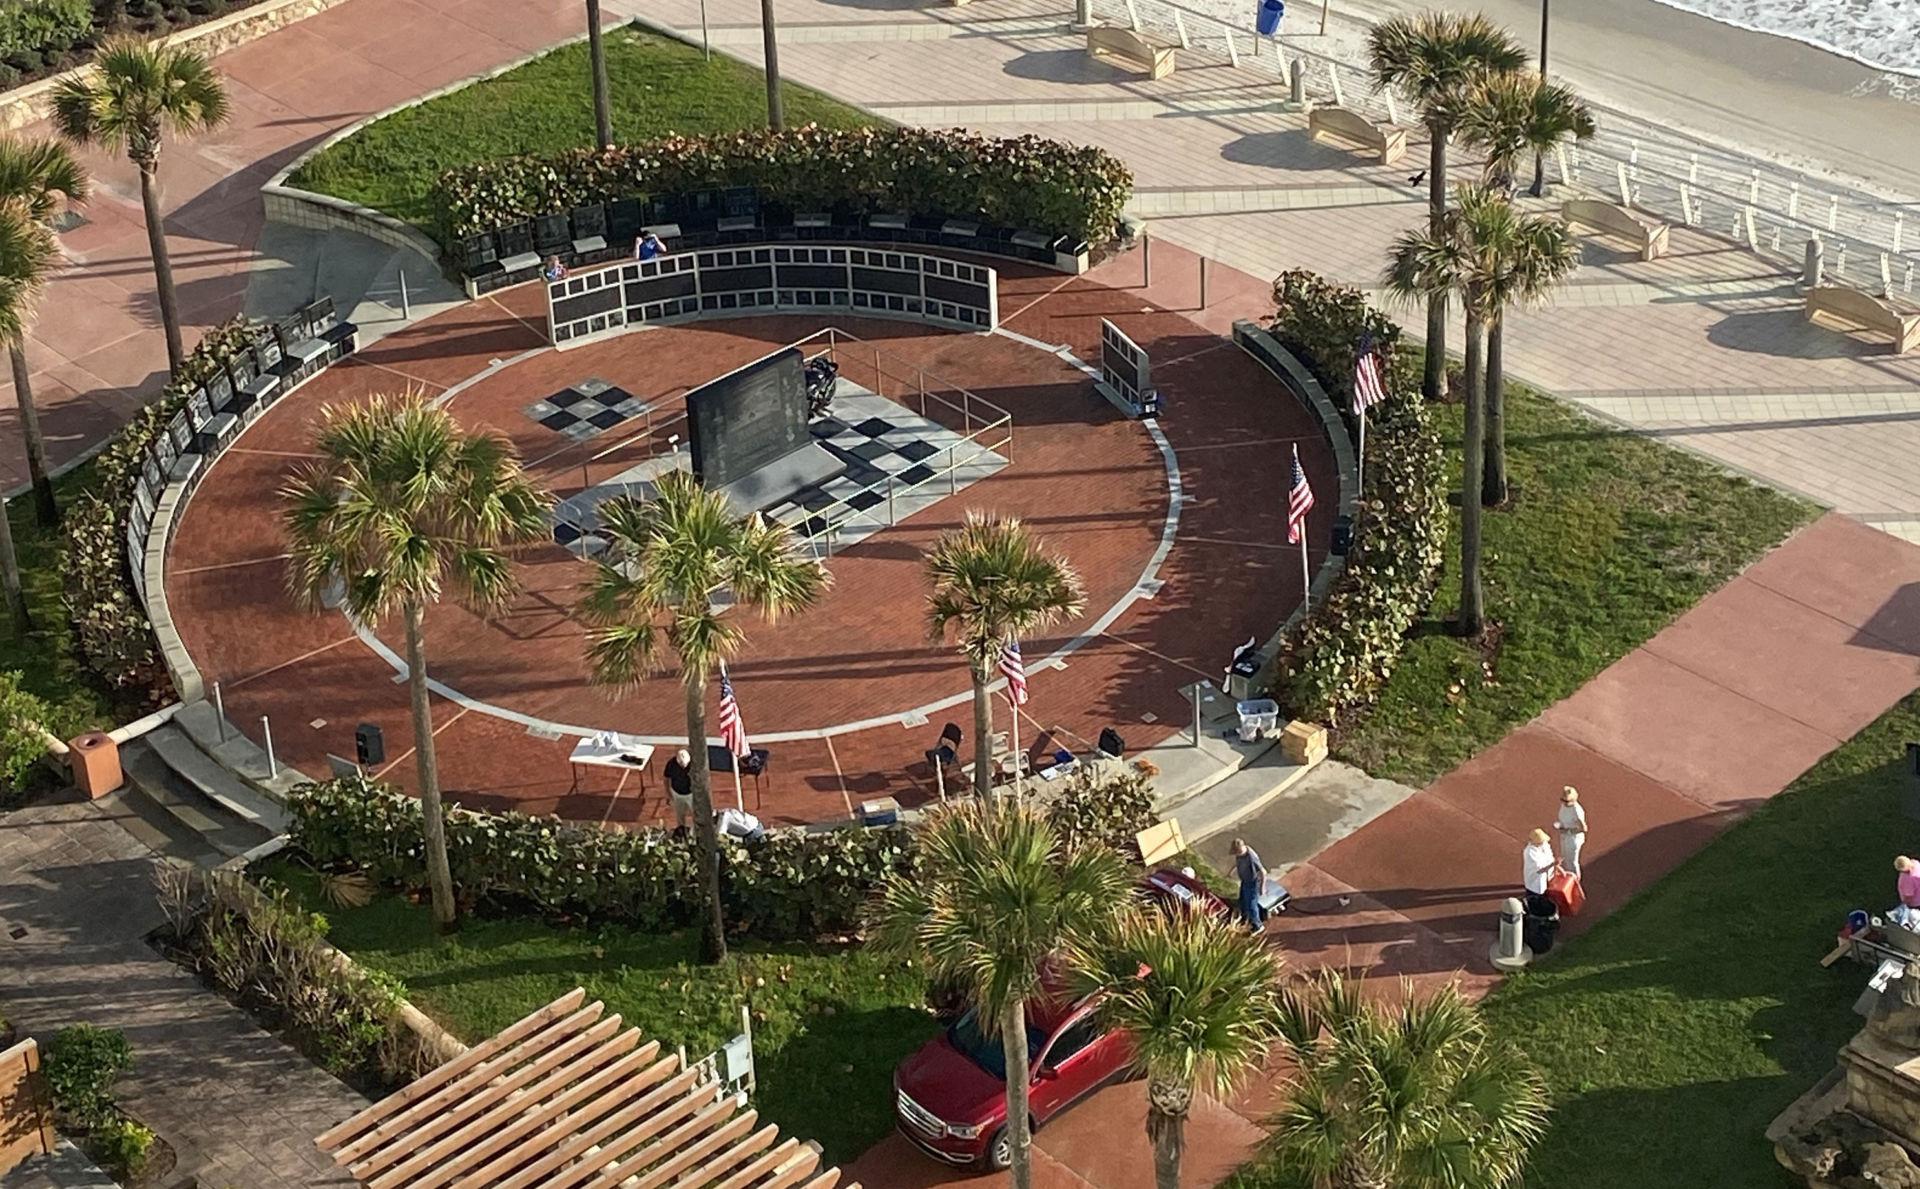 The Daytona 200 Monument in Daytona Beach, Florida. Photo by Michelle A. Lindsay.